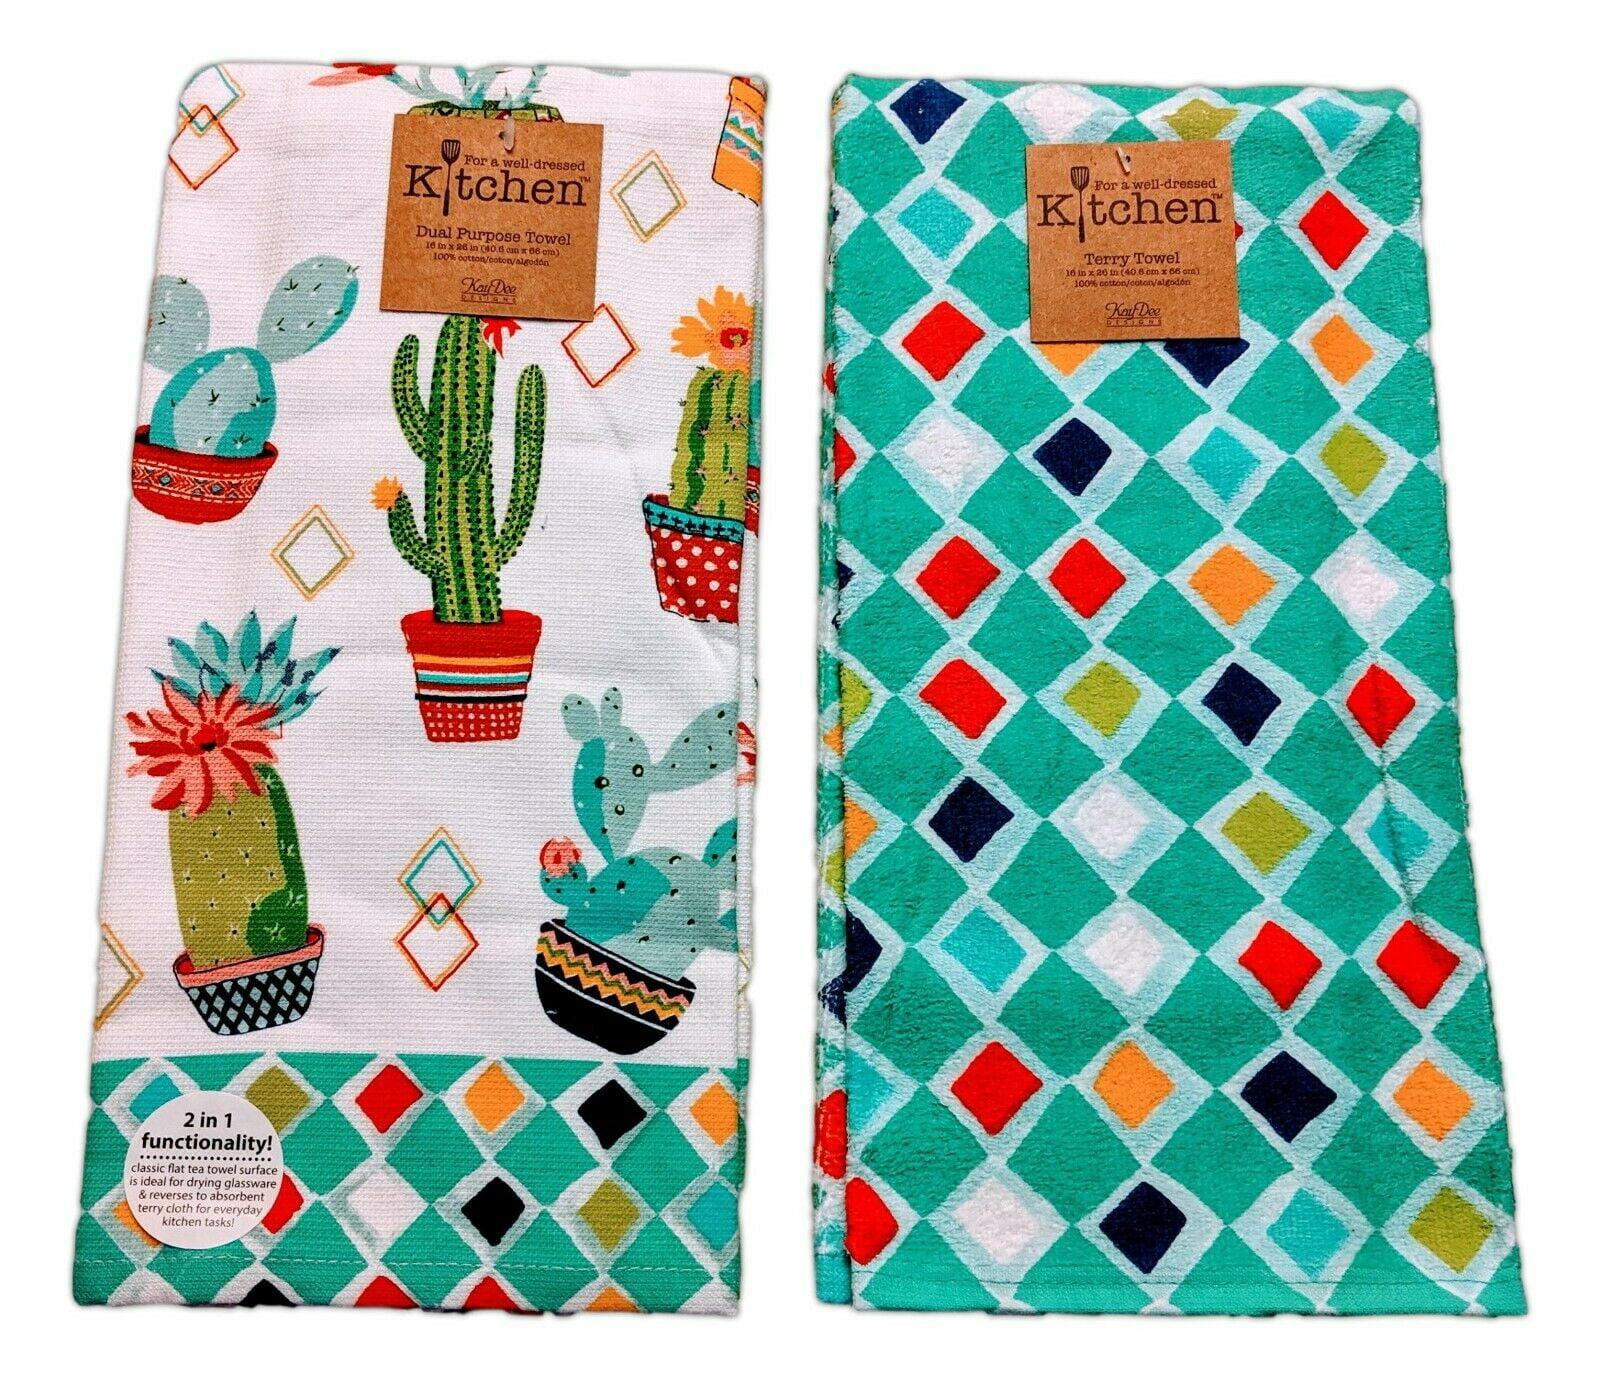 - Oven Mitt Dish Cloth Hand Towel and Potholder Tea Towel Kay Dee Designs Live Simply Kitchen Towel Set 3 pc